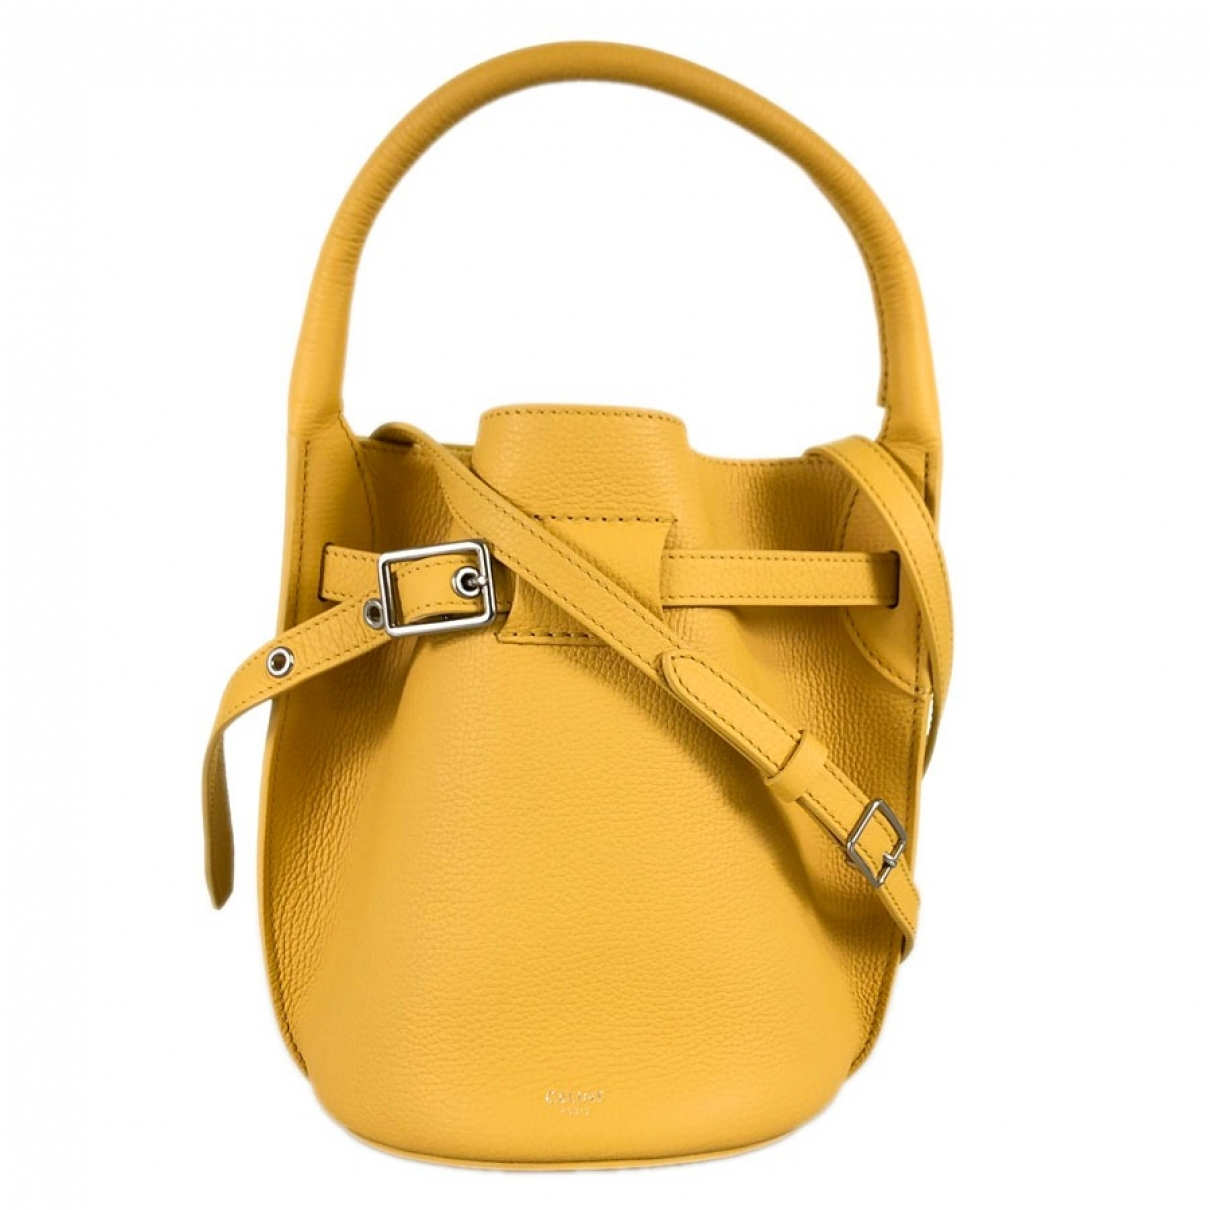 Celine \N Yellow Leather handbag for Women \N